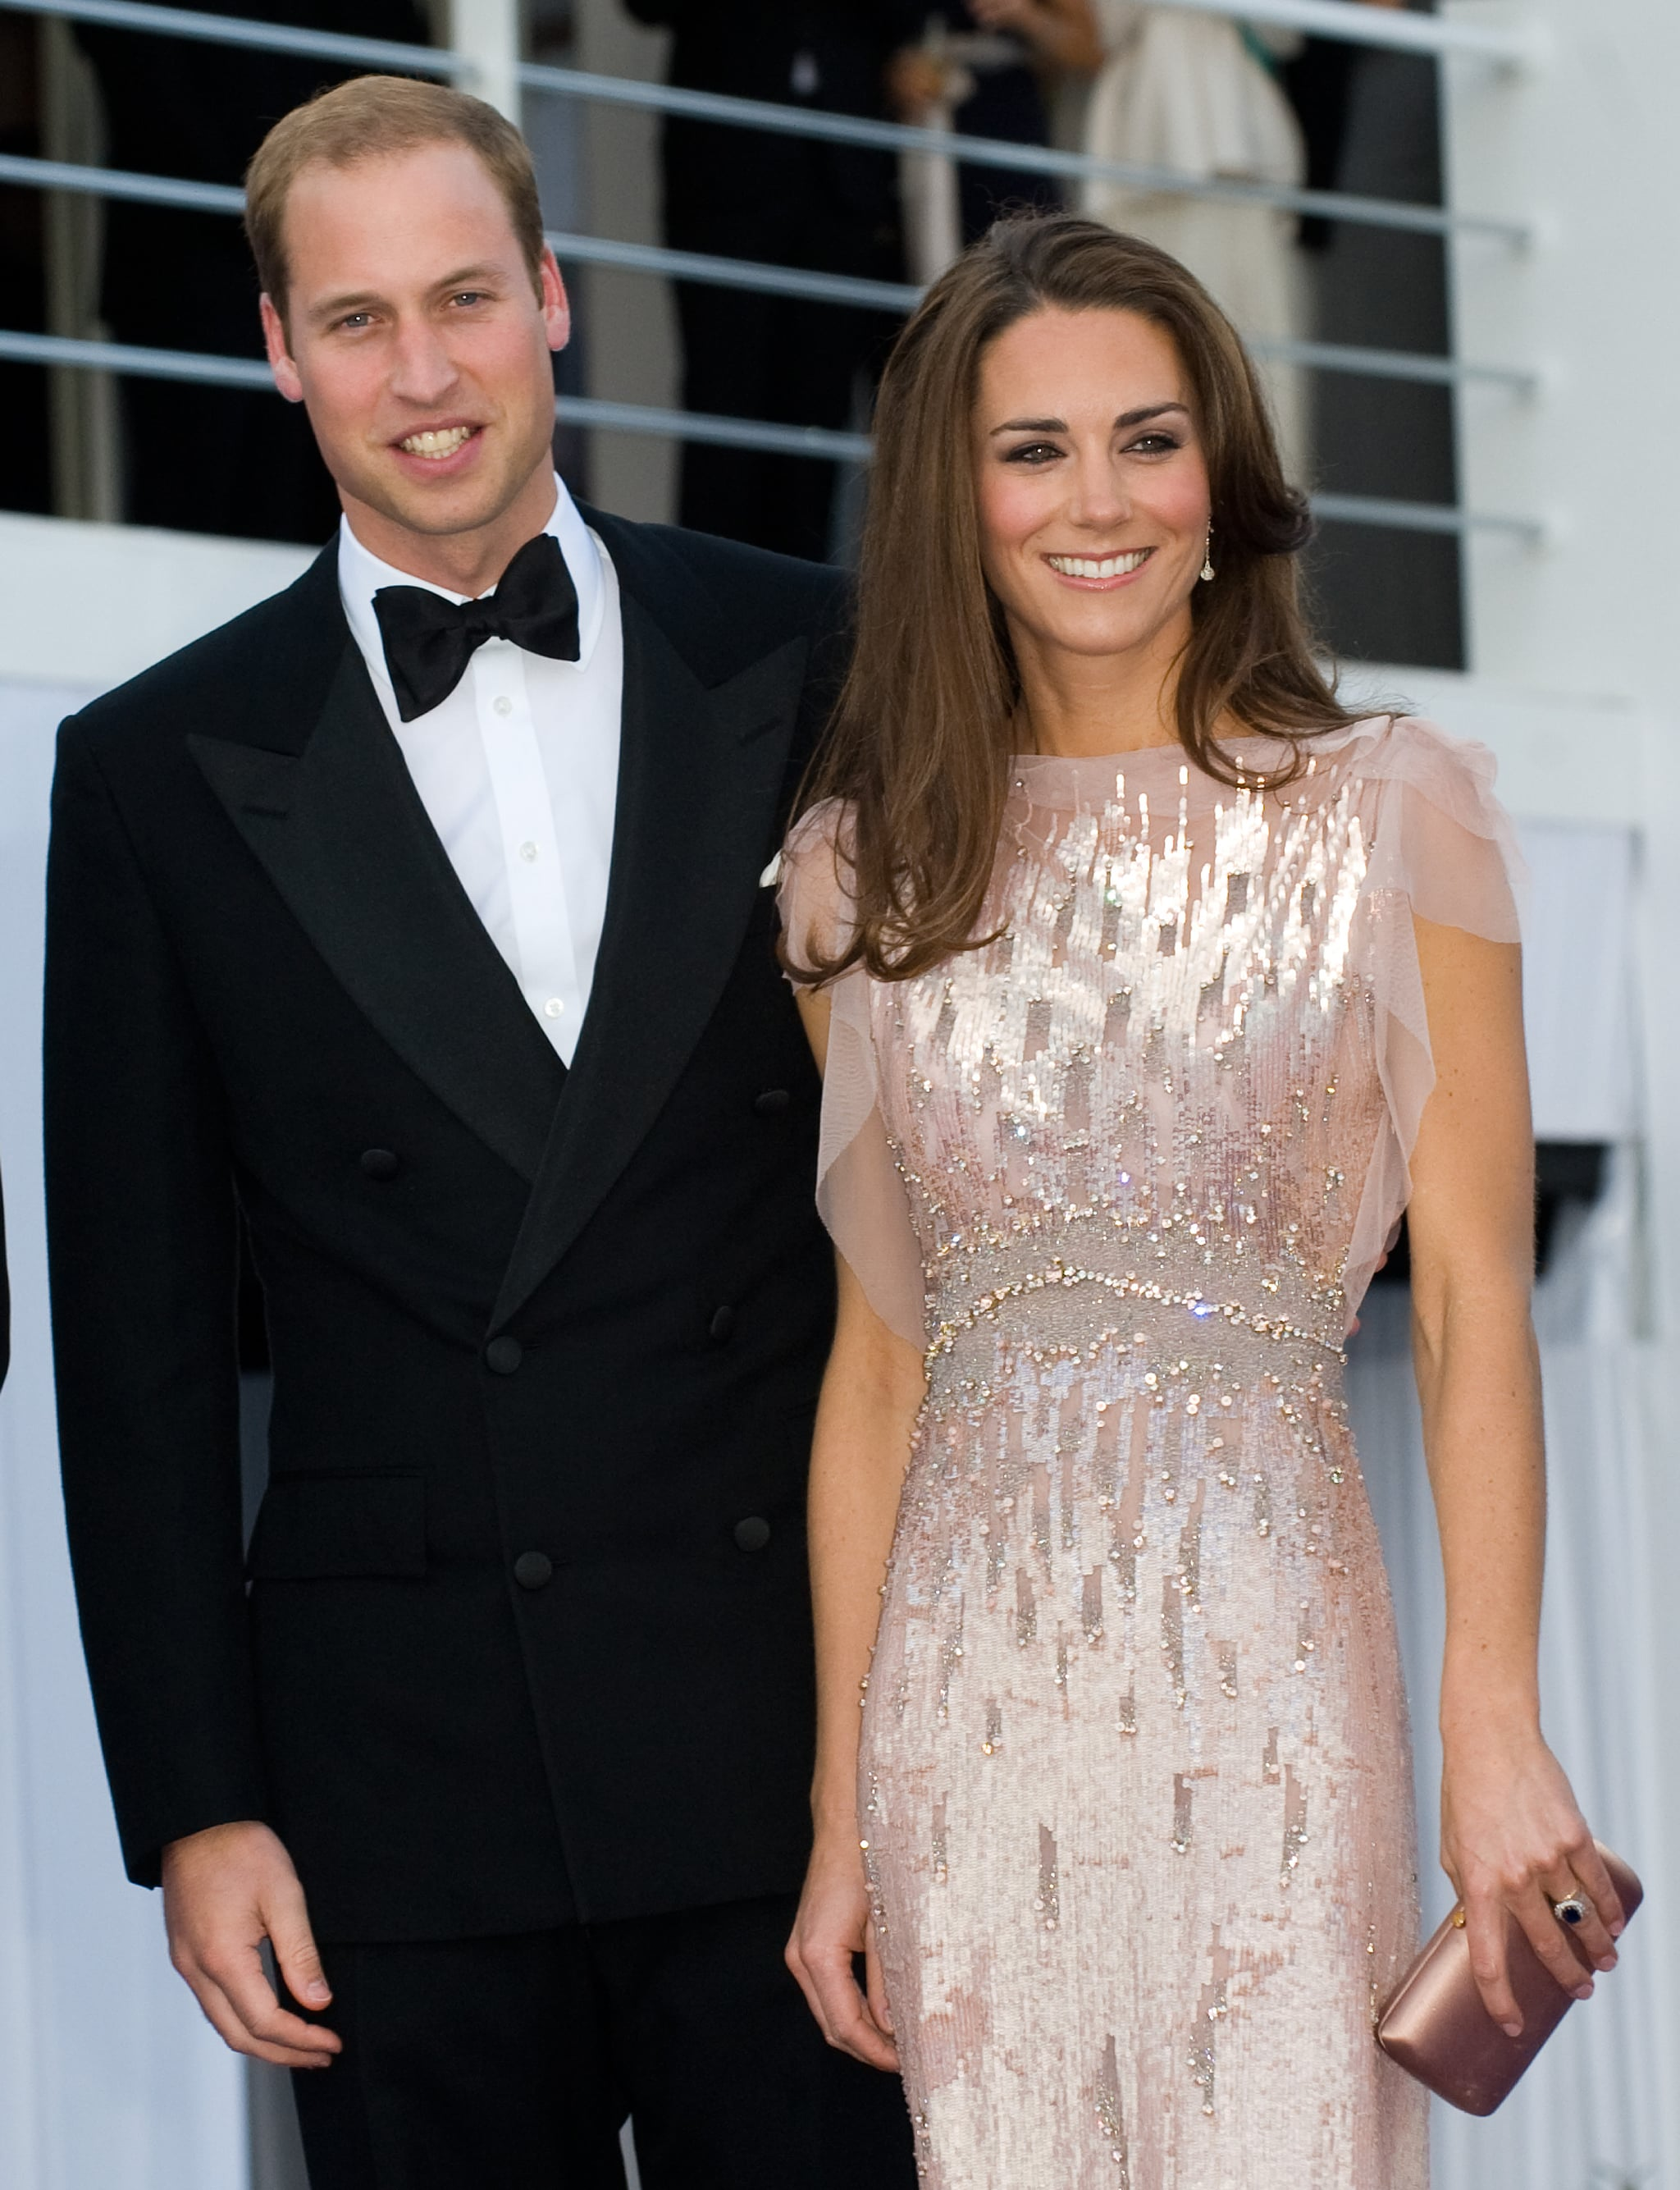 The Royal Couple at the ARK Anniversary Gala